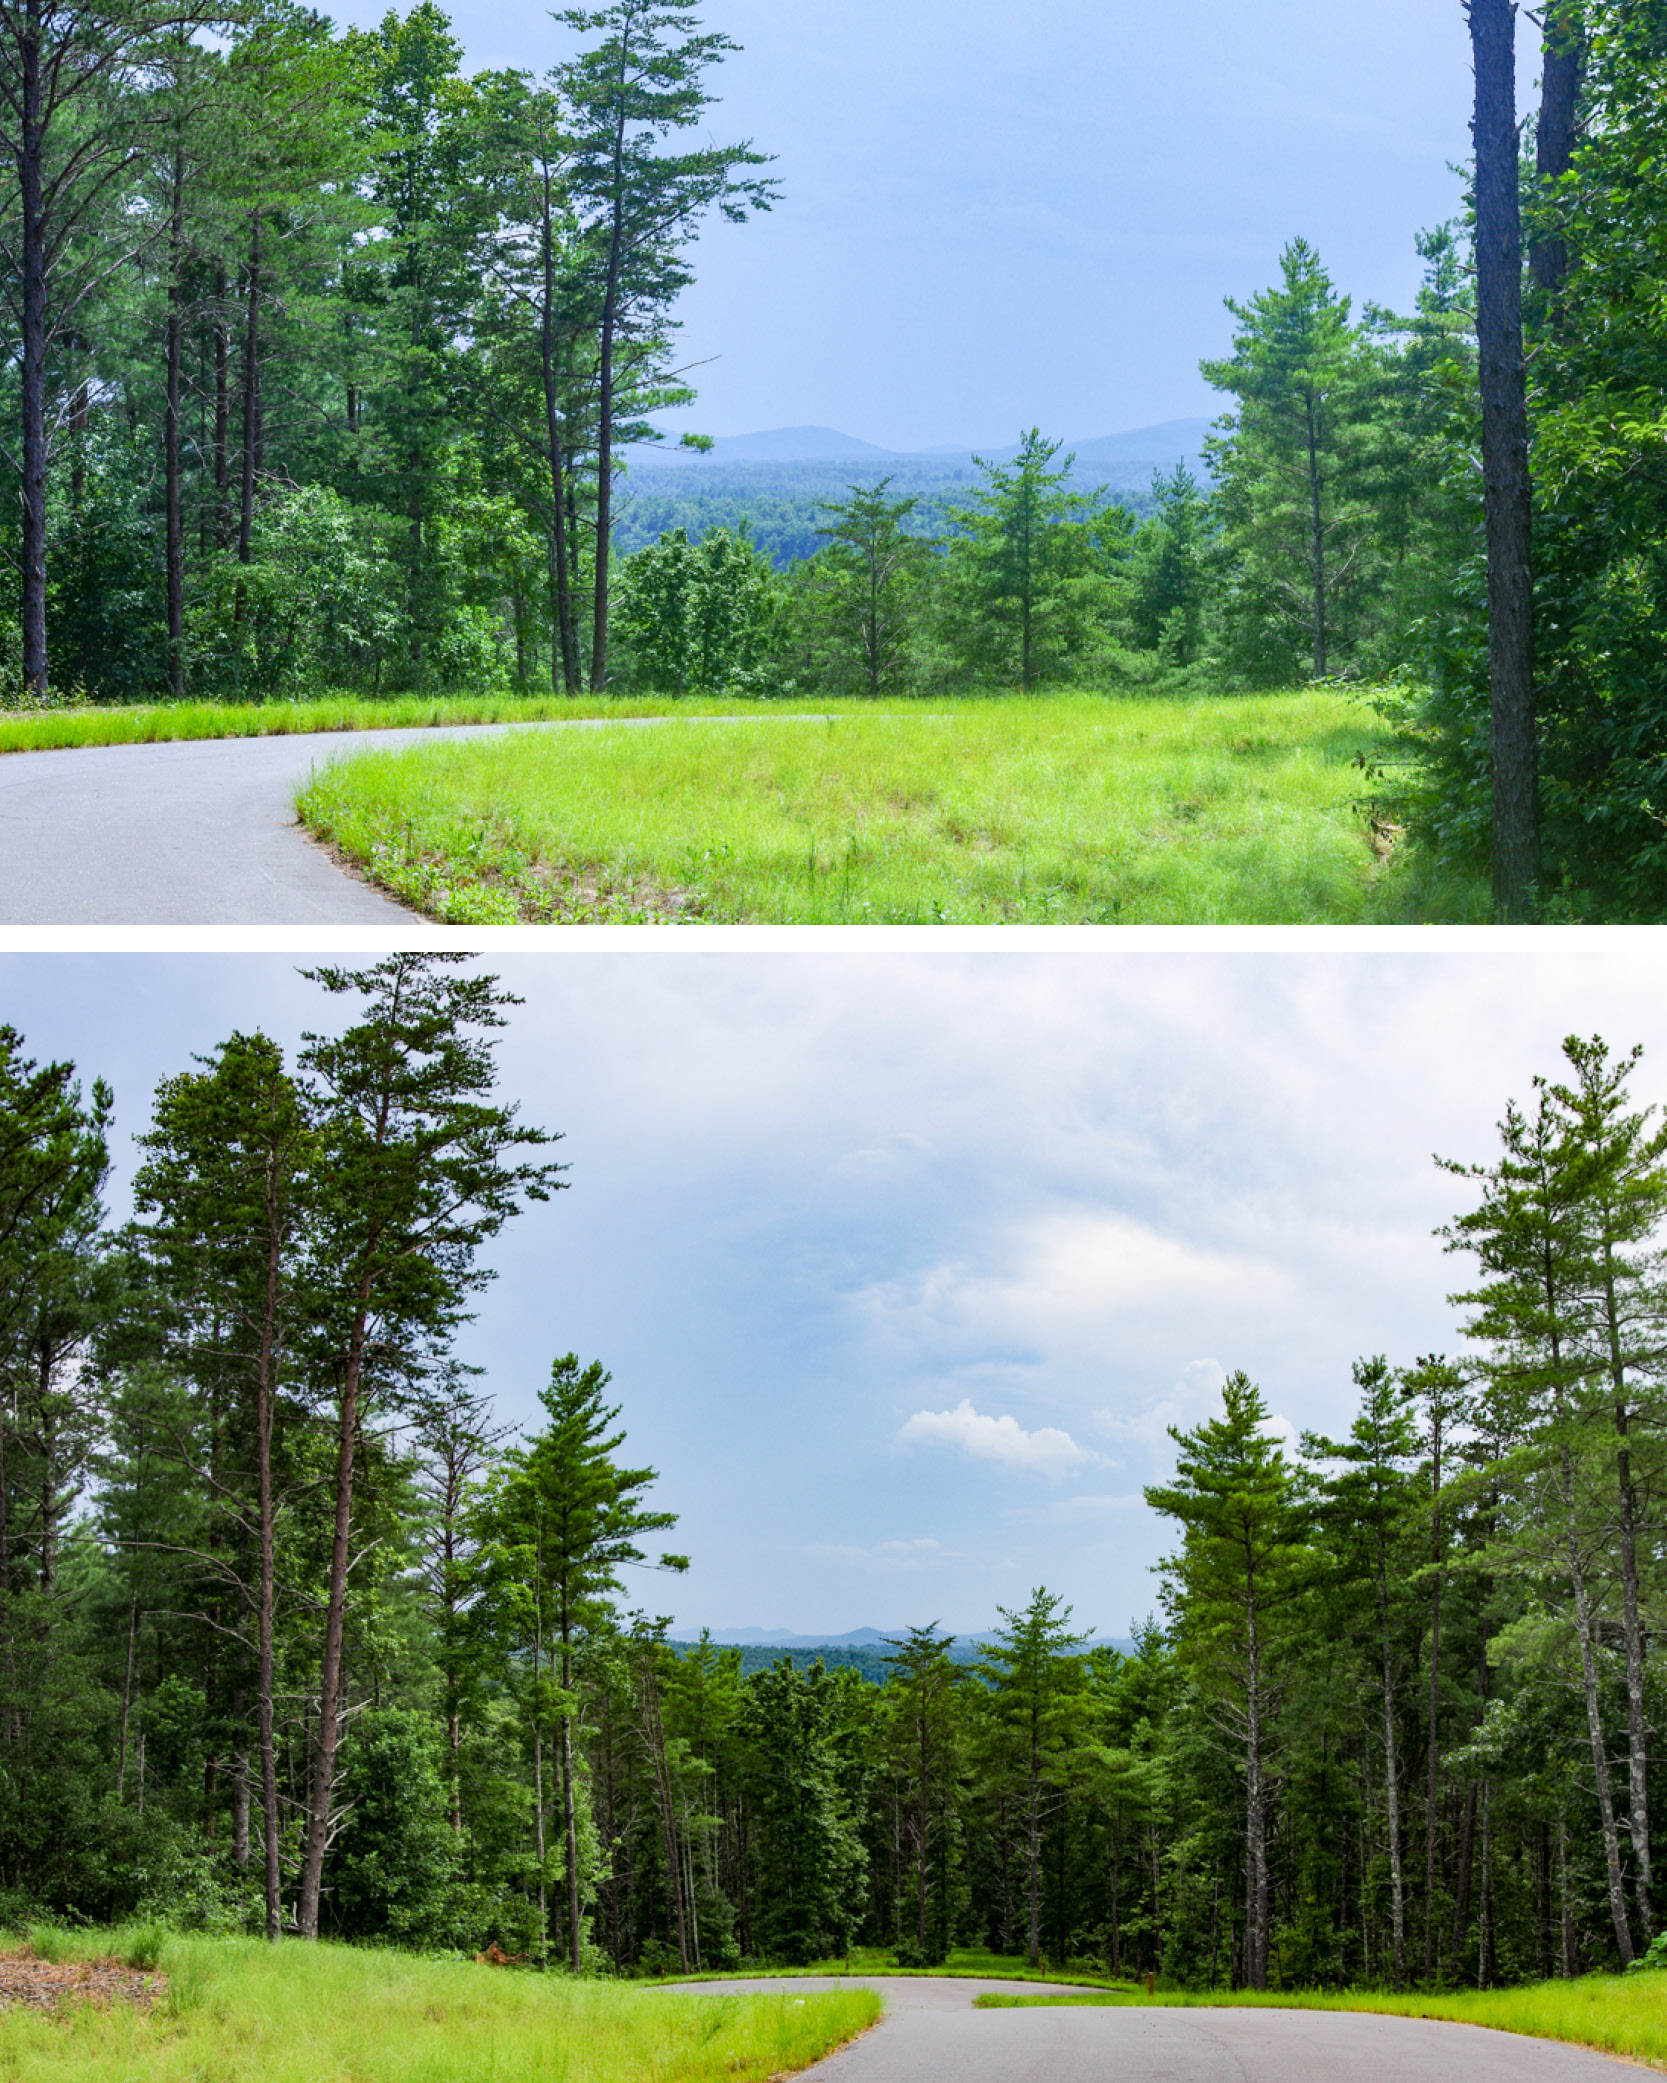 Lake James, NC - Blue Ridge Mountains